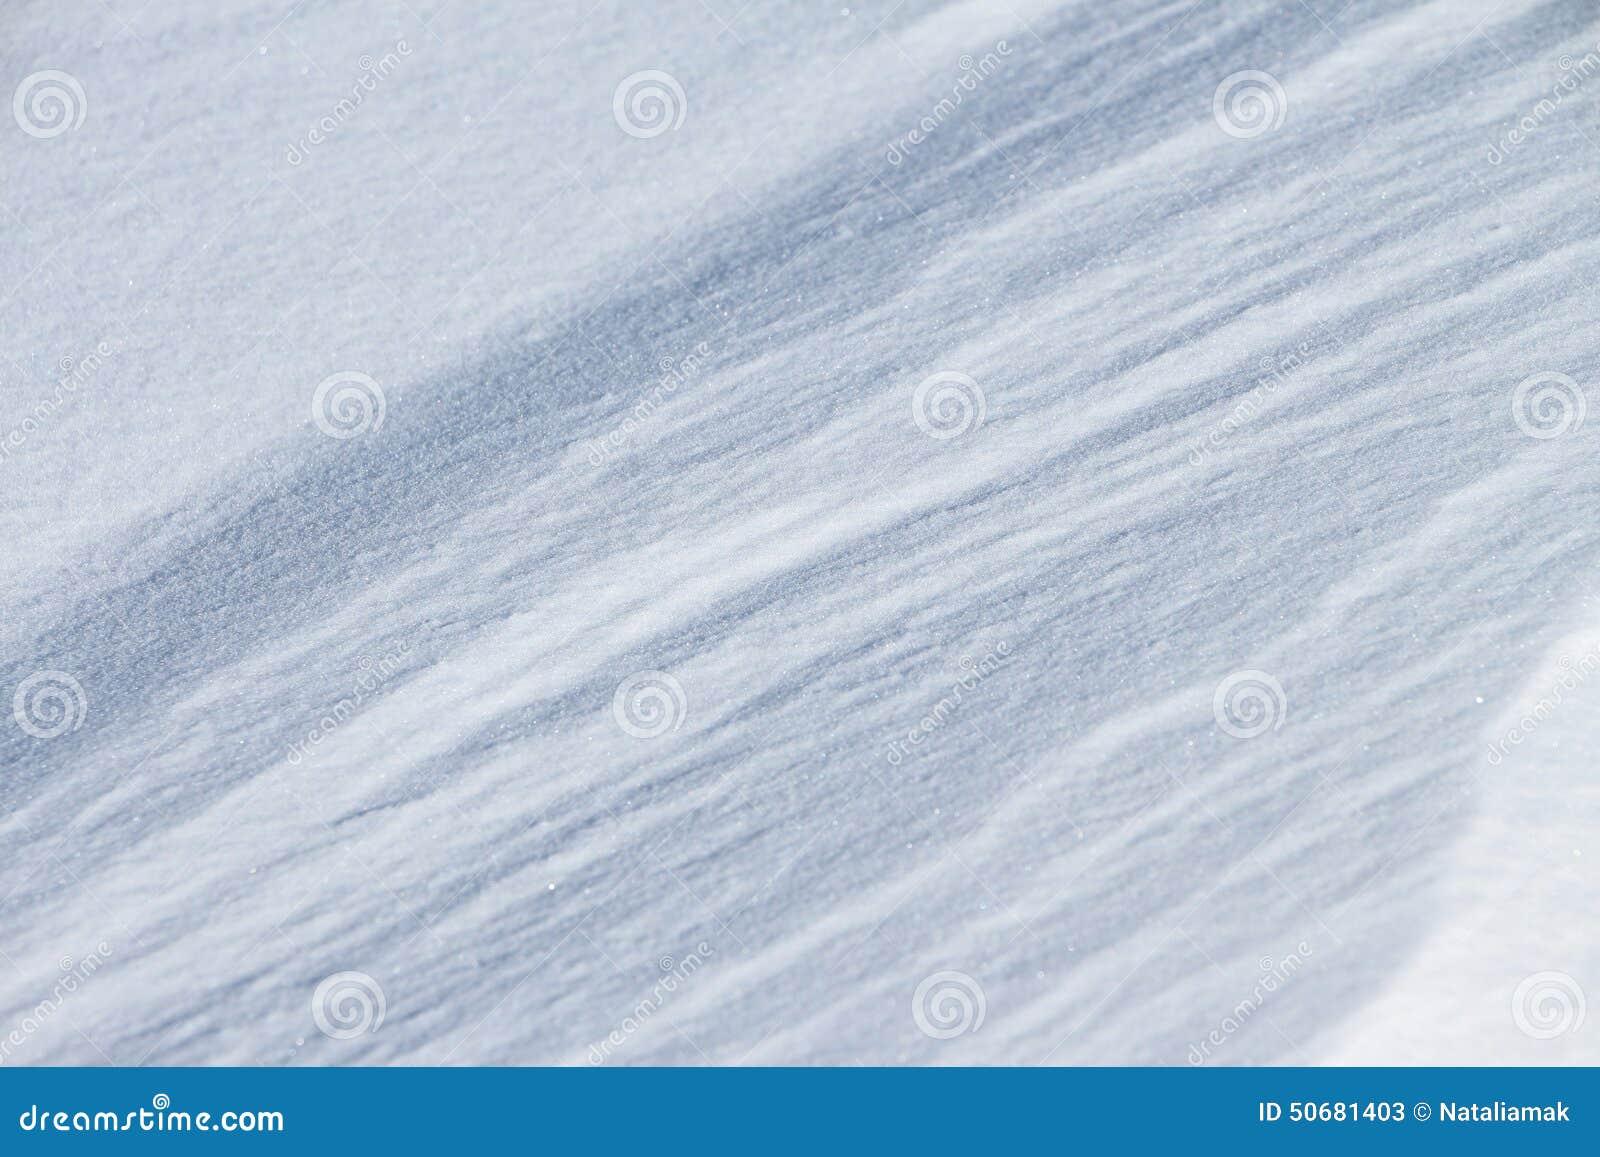 Download 背景自然雪 库存图片. 图片 包括有 替补, 波动, 表面, beauvoir, 特写镜头, 室外, 背包 - 50681403